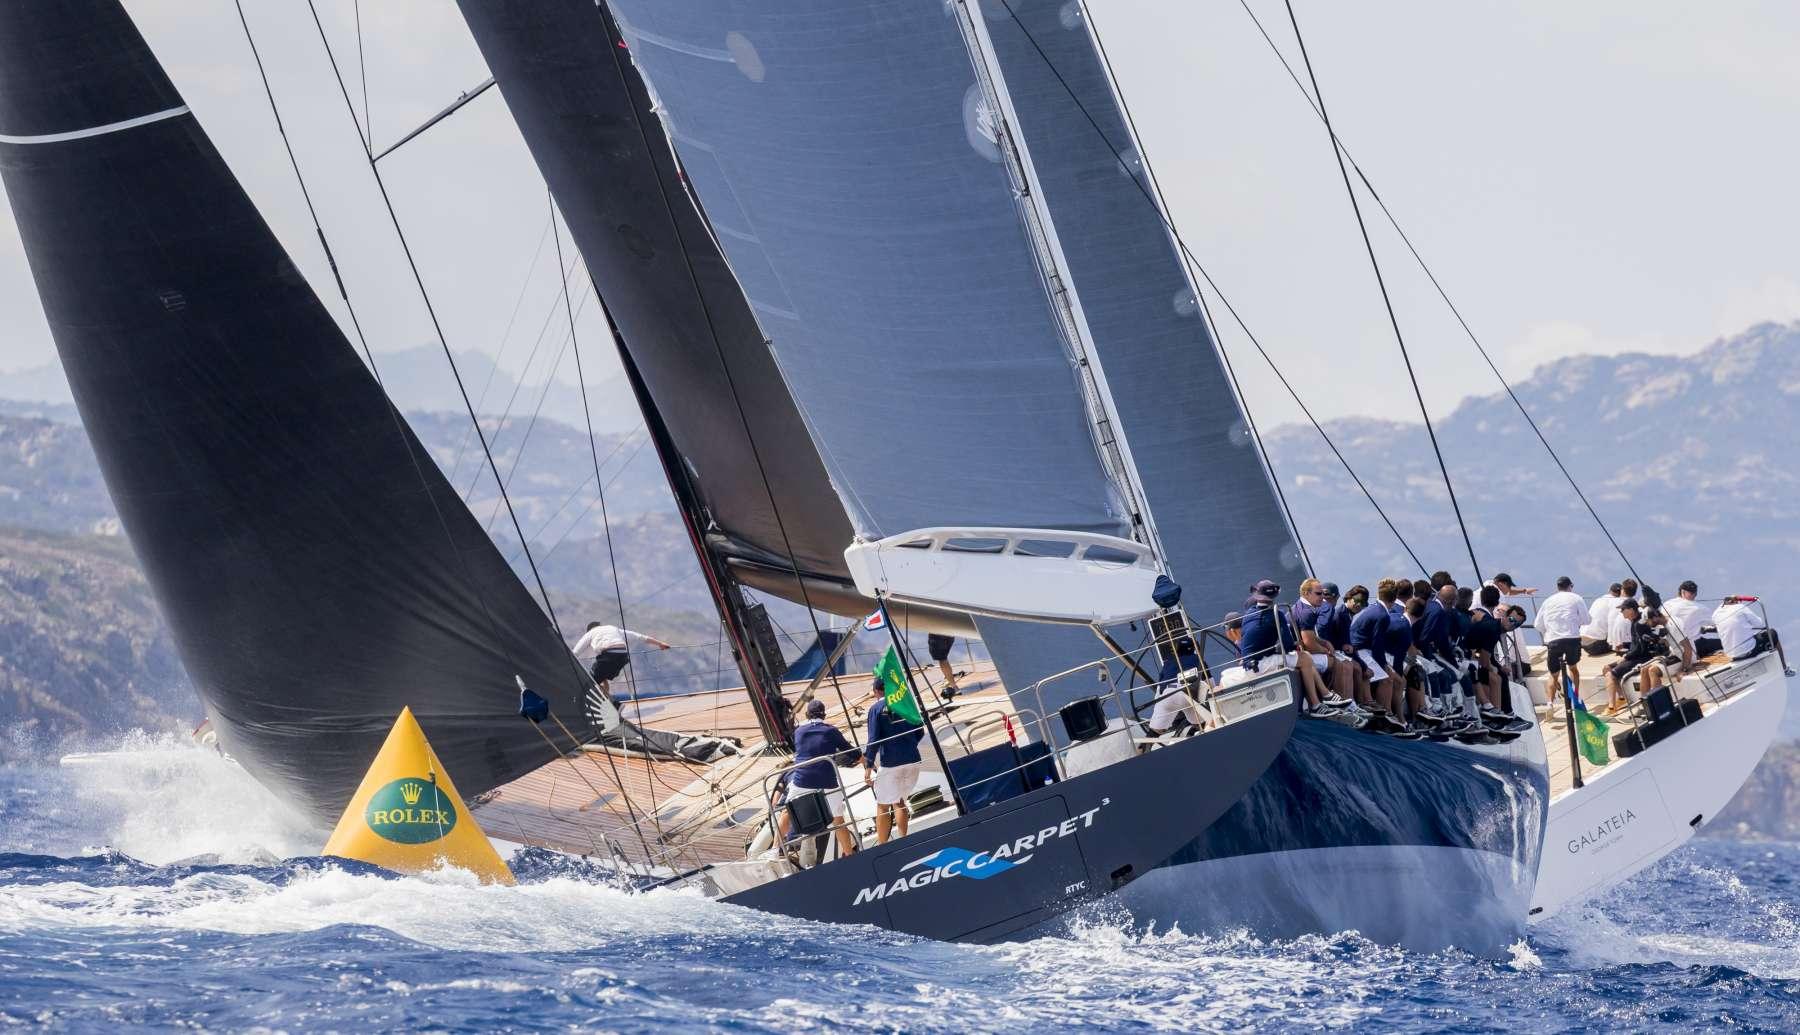 Maxi Yacht Rolex Cup 07 09 2017 Borlenghi 02